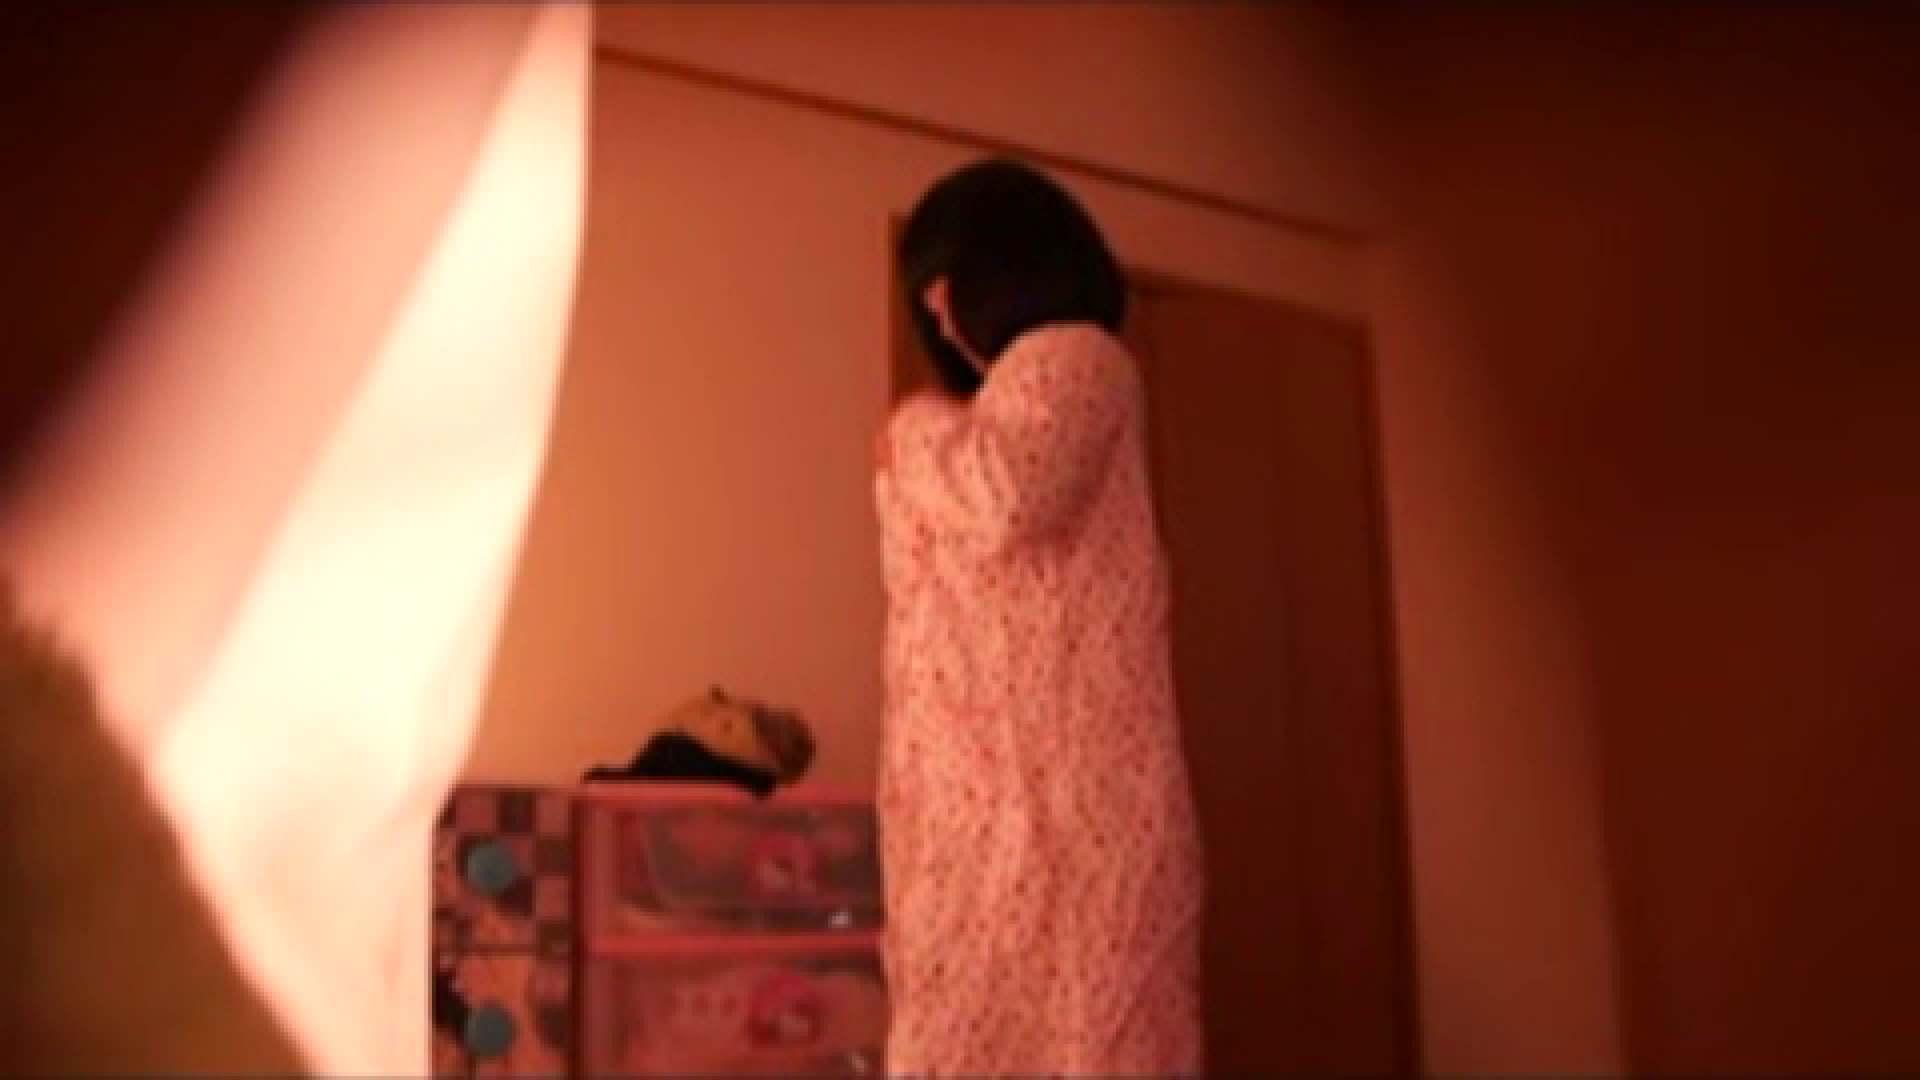 vol.2 まりこさんのお着替え、就寝前の映像です。 エッチすぎるOL達 | 着替えシーン  29連発 13